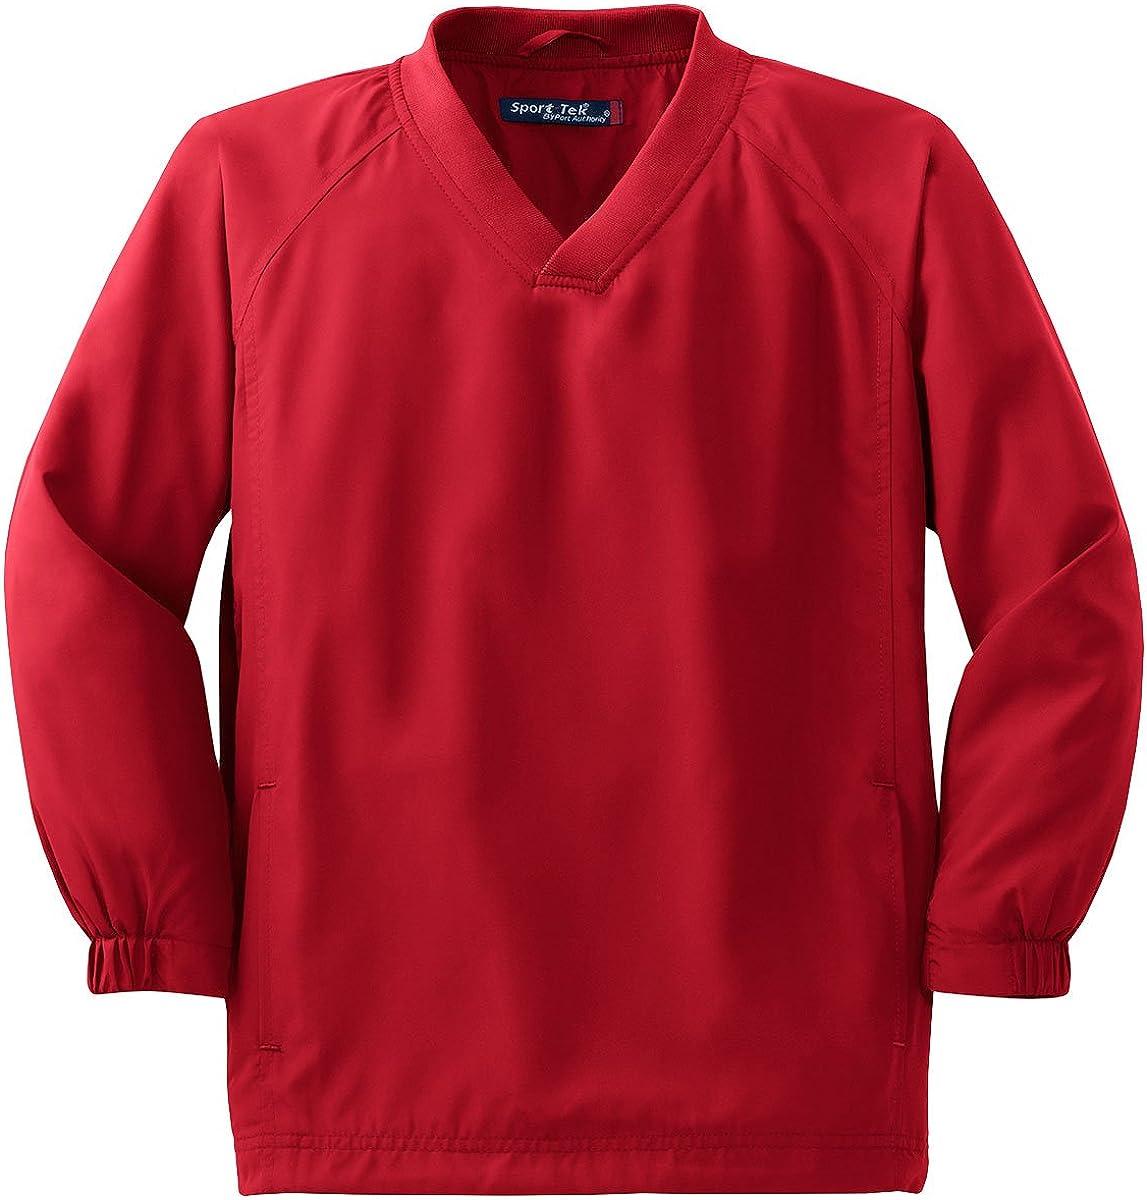 YST72 Youth V-Neck Raglan Wind Shirt True Red M